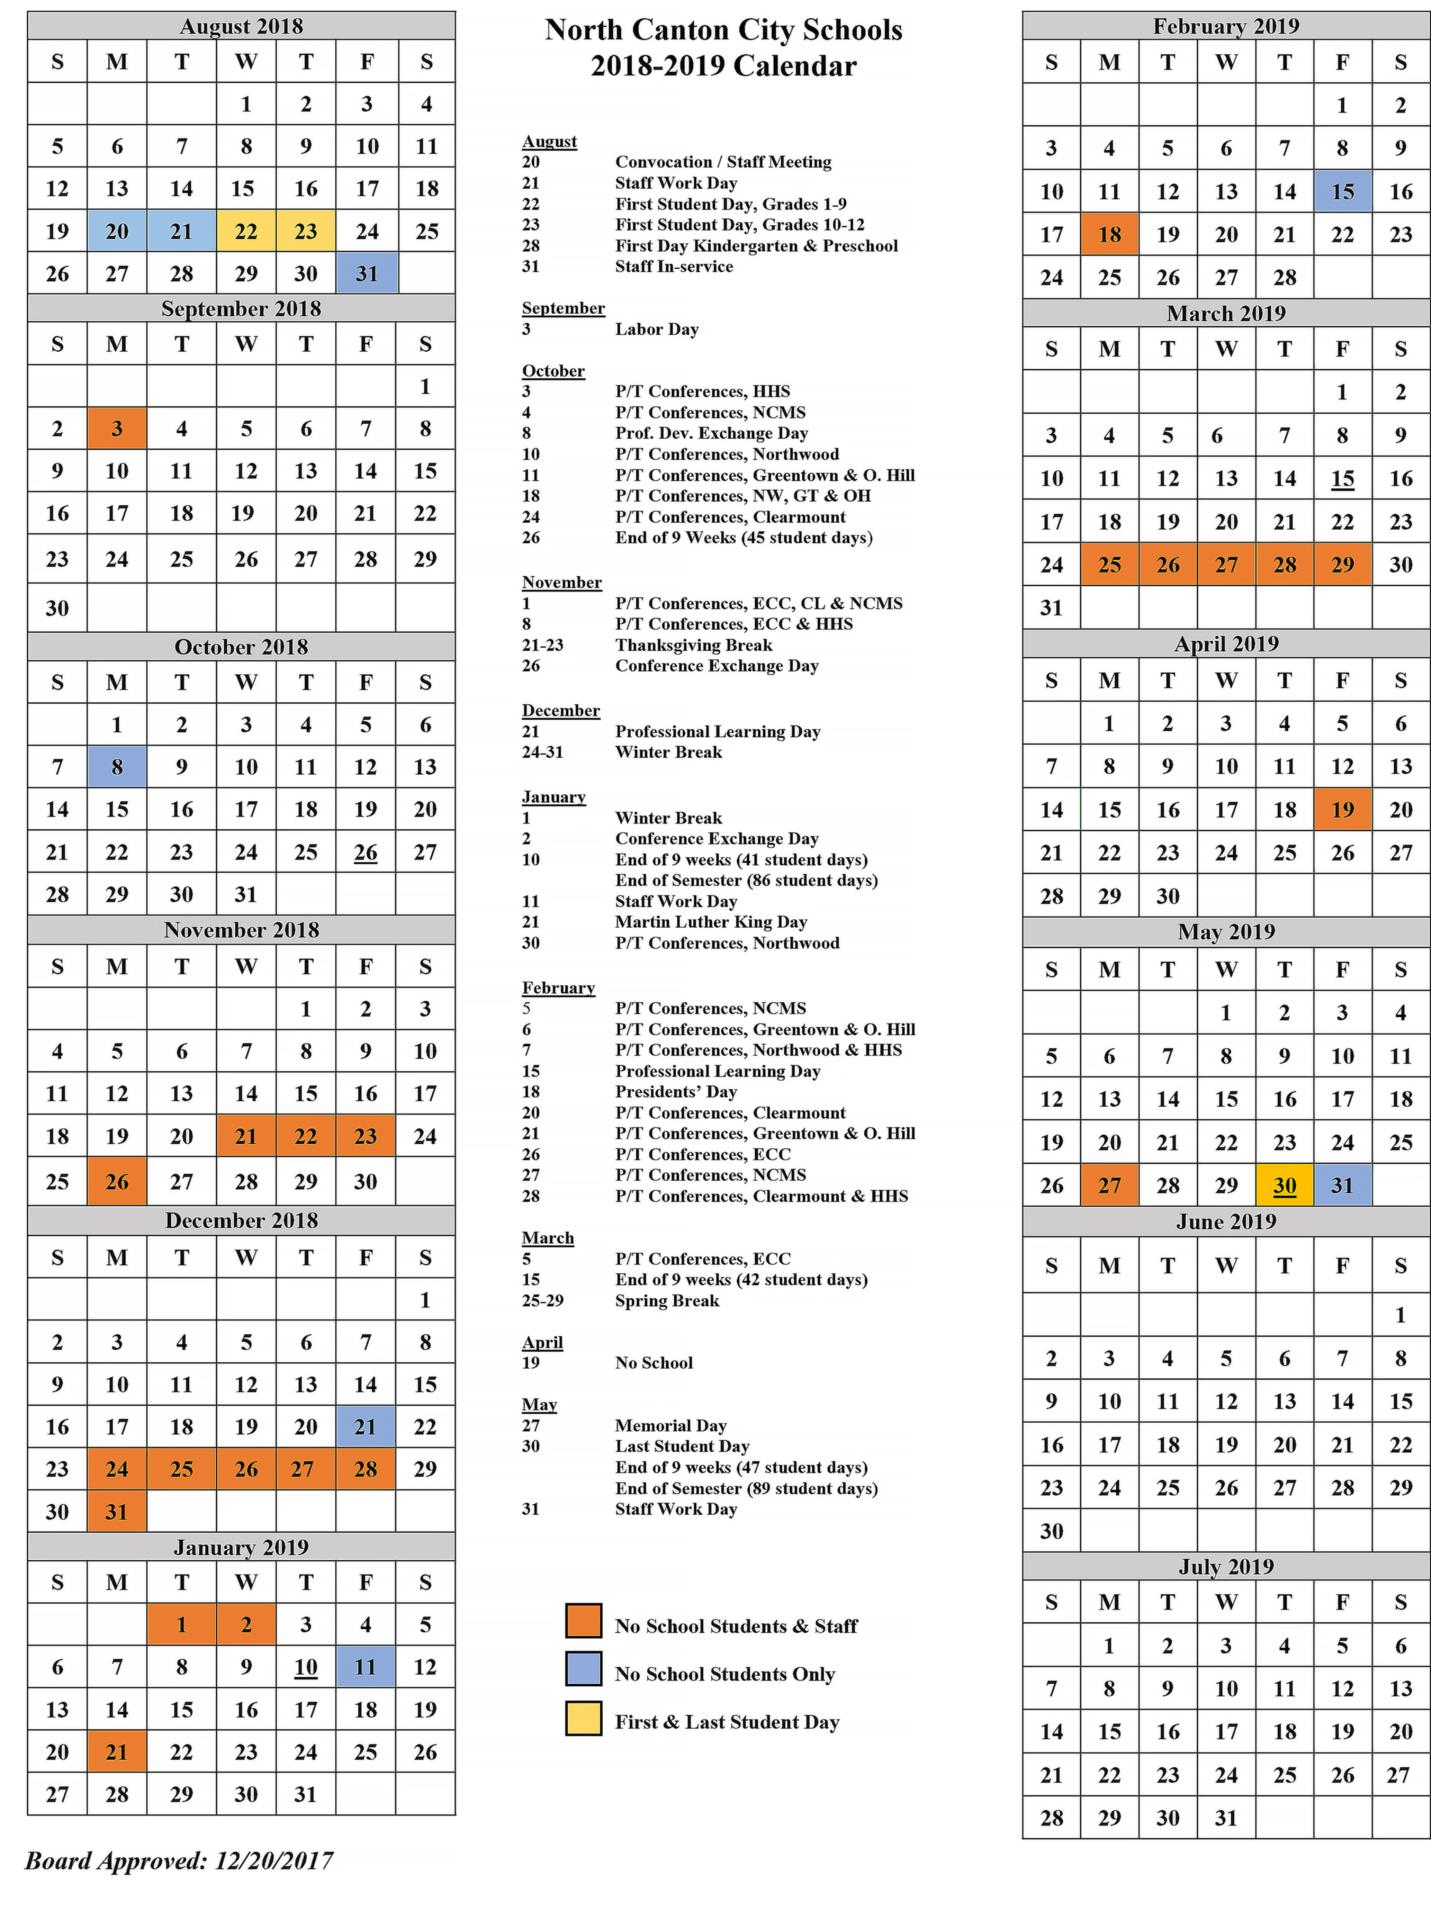 calendar for 2018-2019